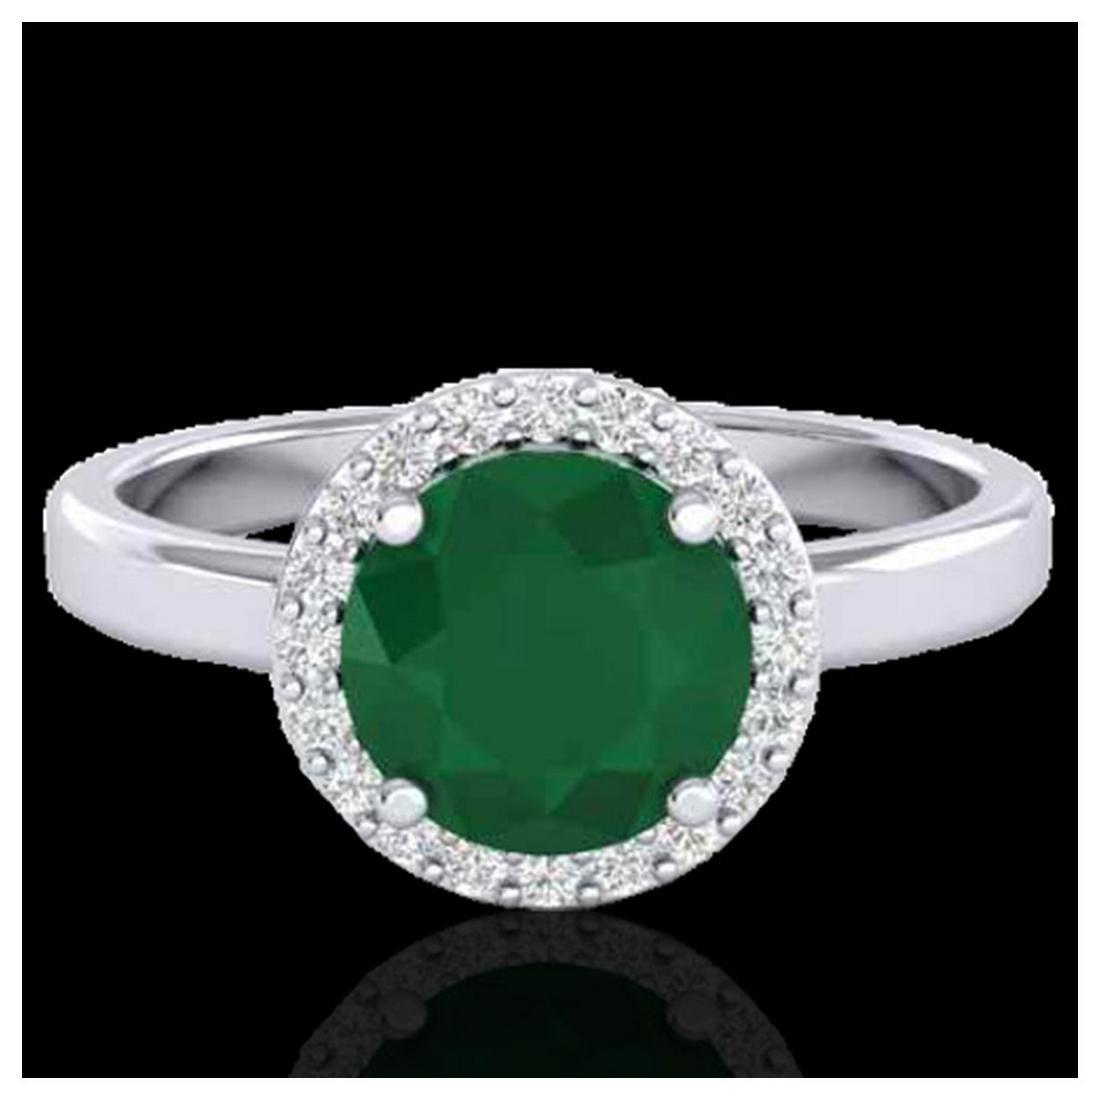 2 ctw Emerald & Halo VS/SI Diamond Ring 18K White Gold